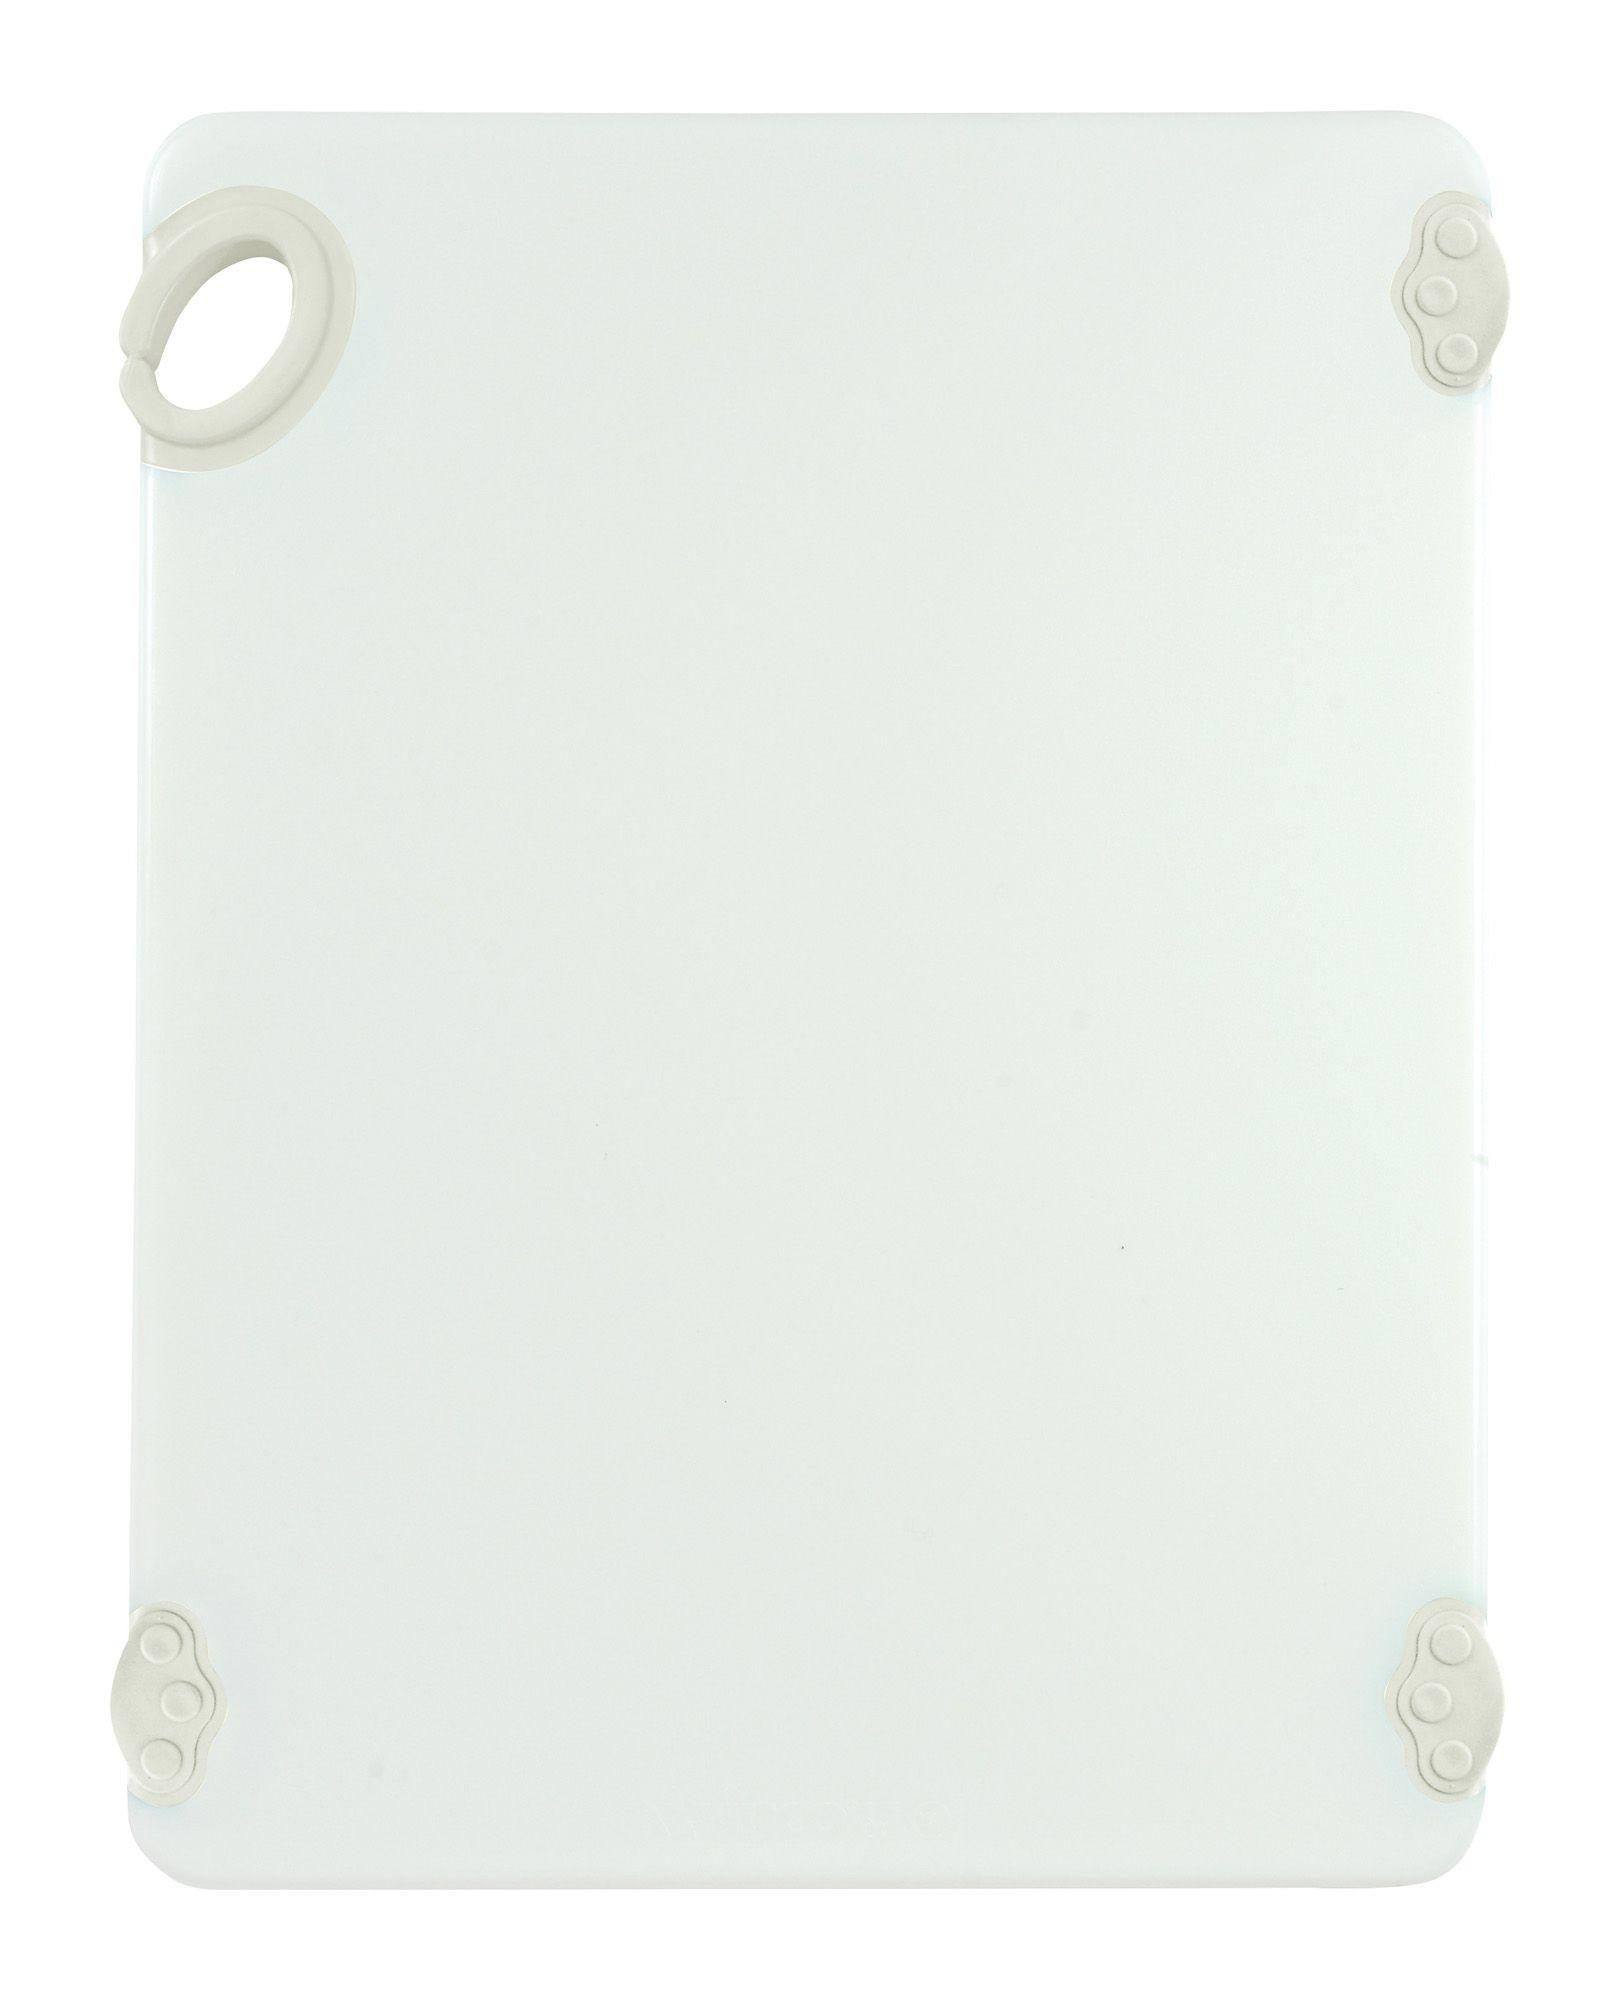 "Winco CBN-1520WT White StatikBoard Cutting Board with Hook, 15"" x 20"" x 1/2"""